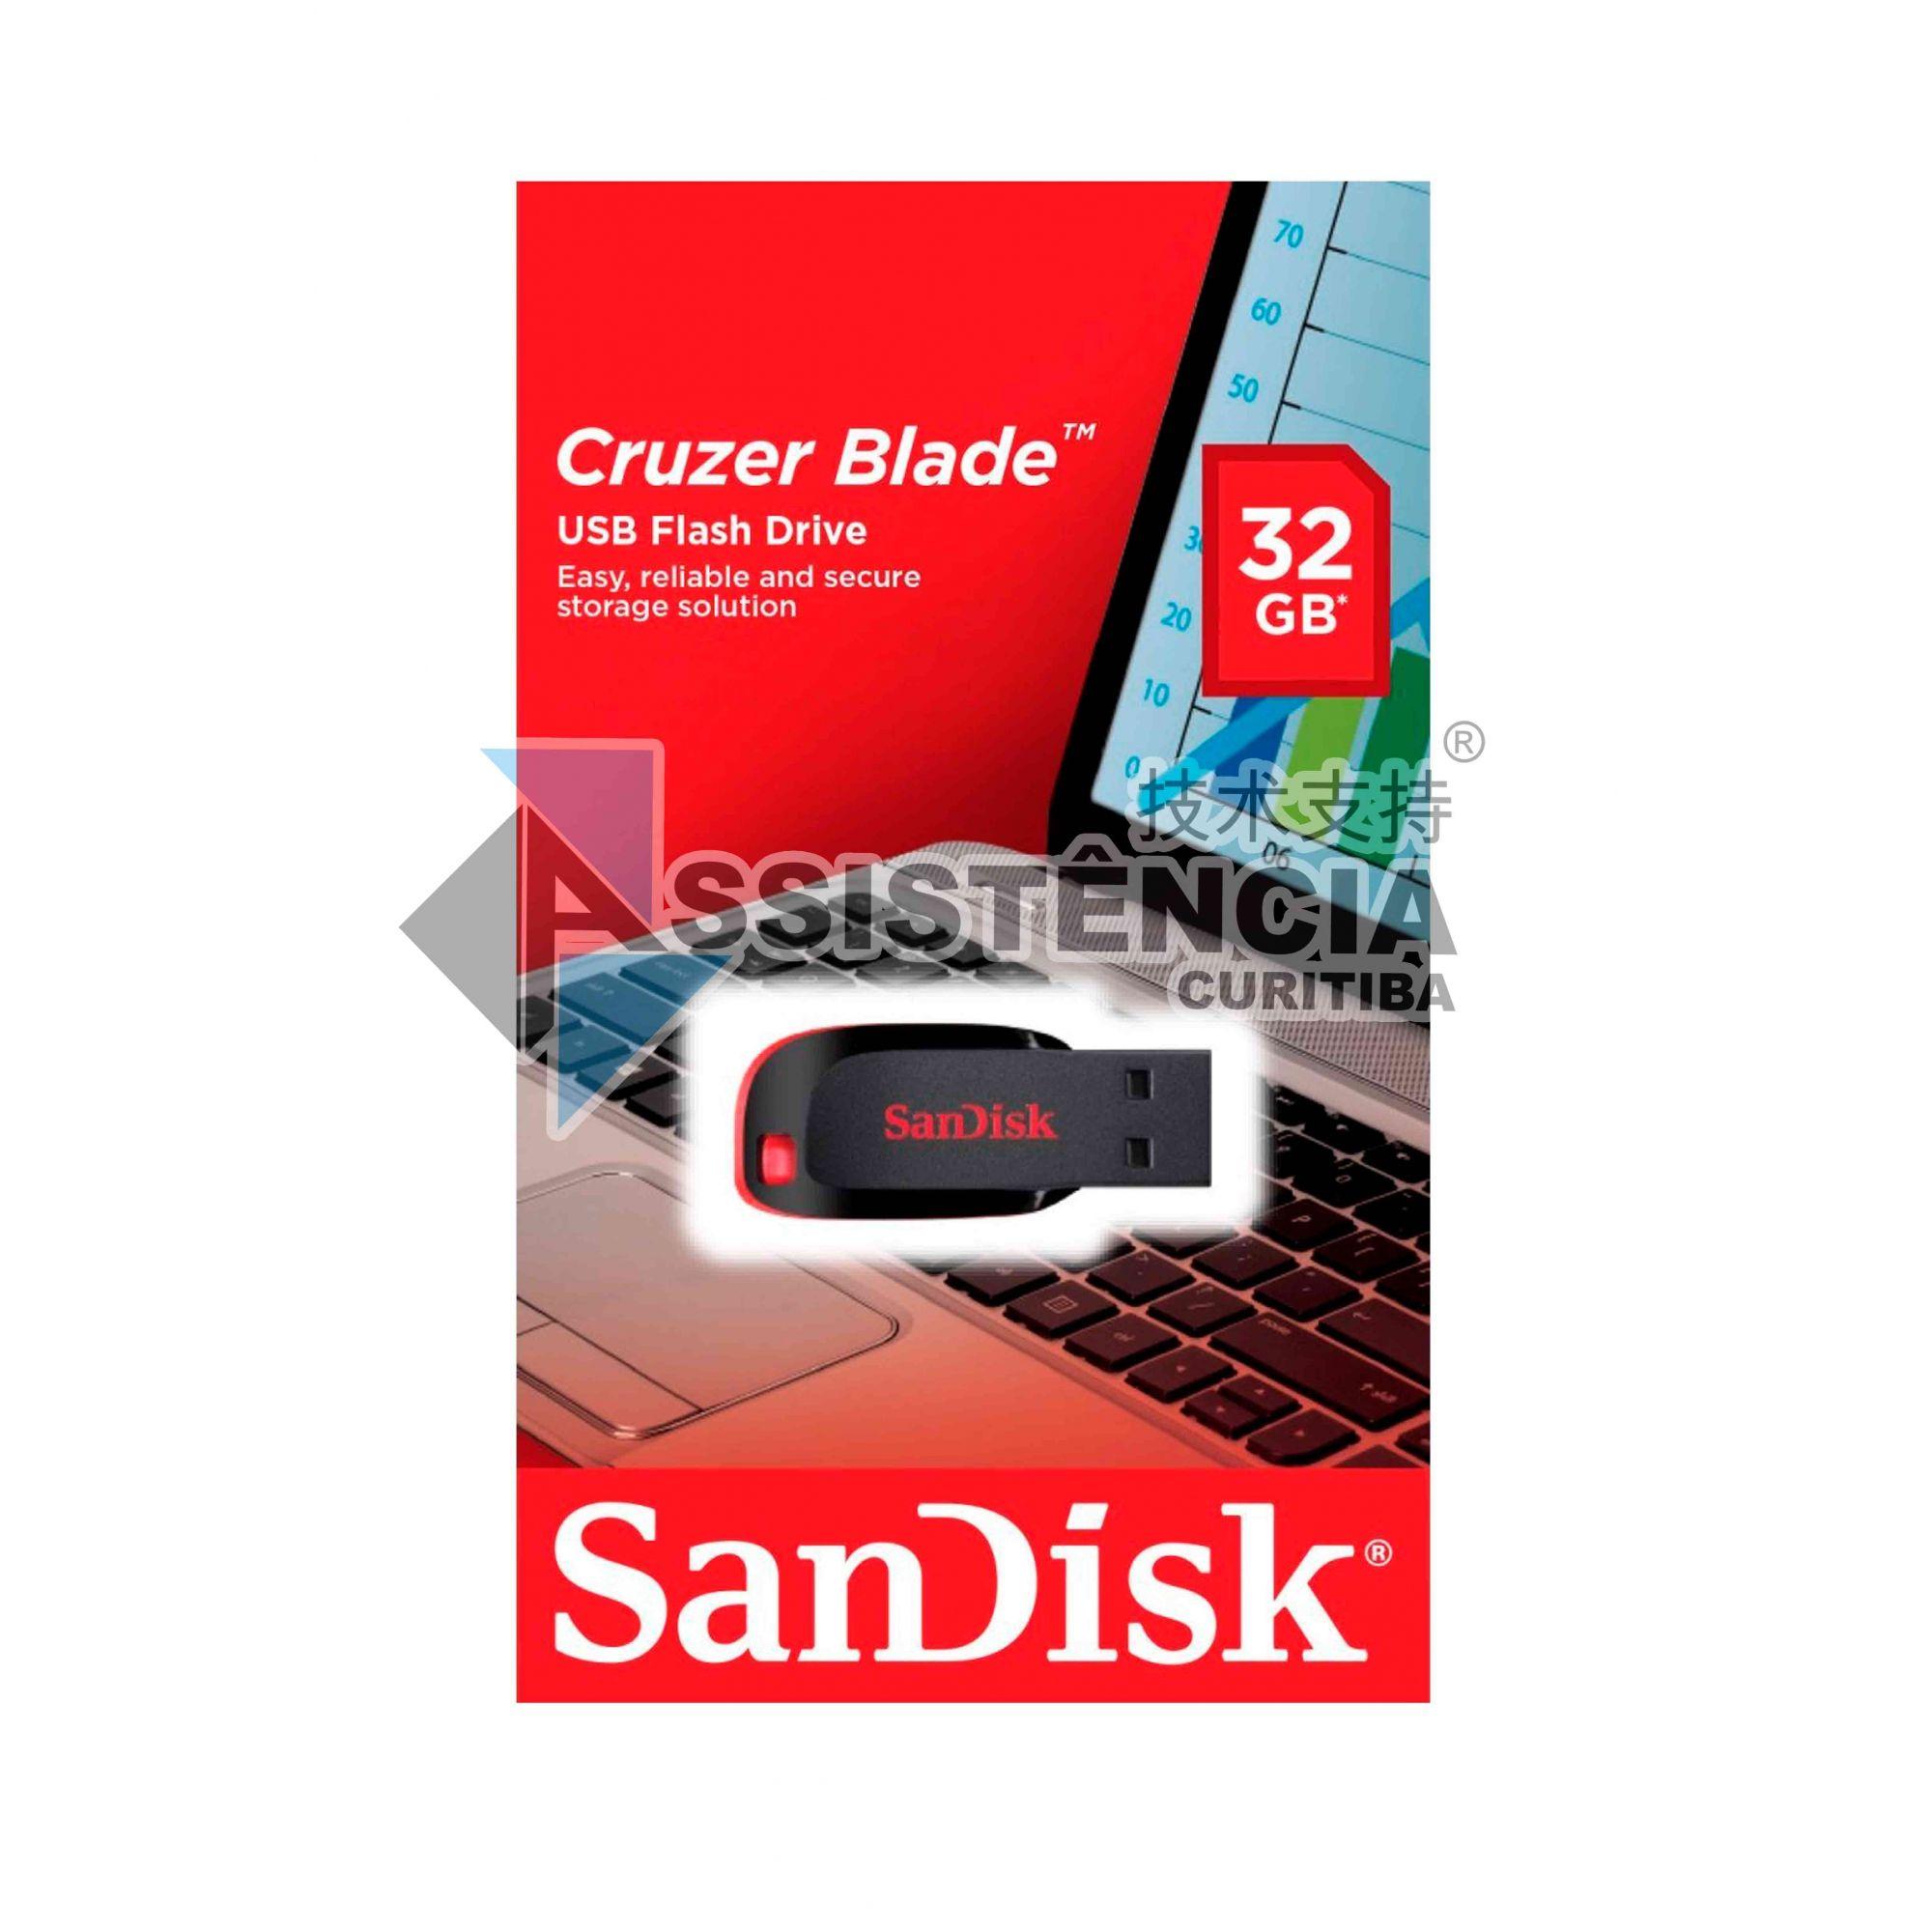 PENDRIVE CRUZER BLADE SANDISK 32GB ORIGINAL